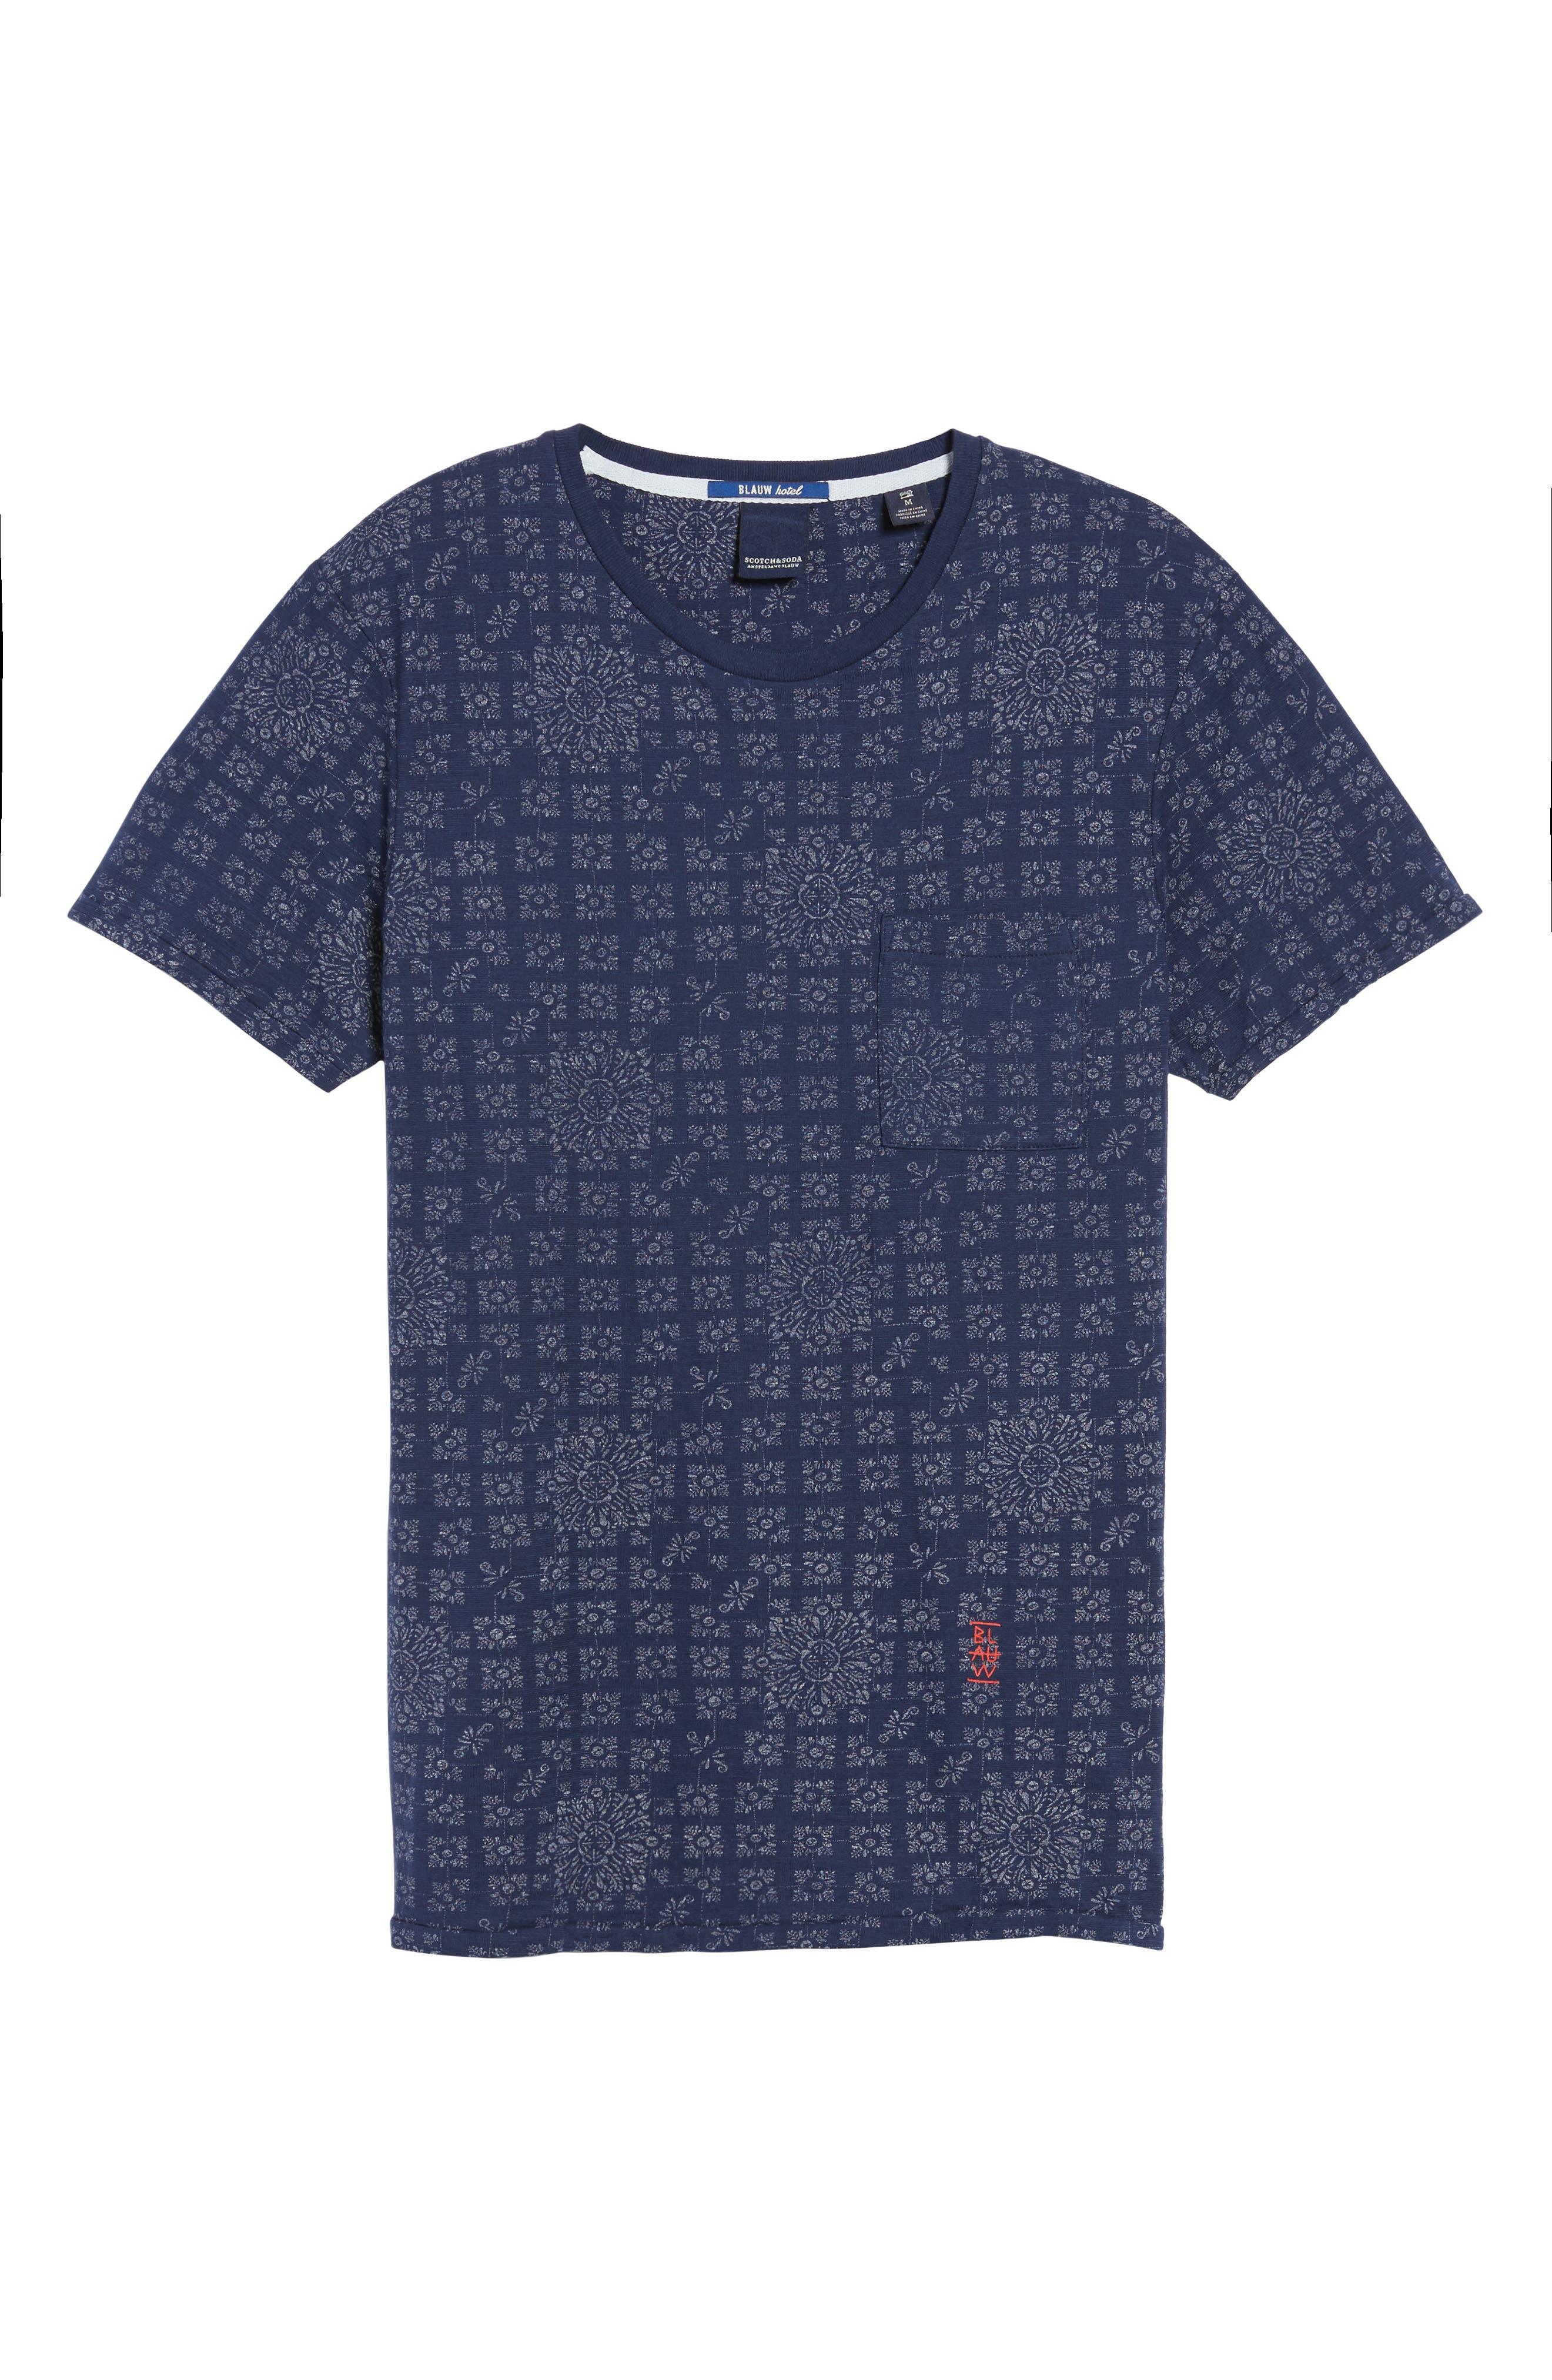 AMS Graphic T-Shirt,                             Alternate thumbnail 6, color,                             410